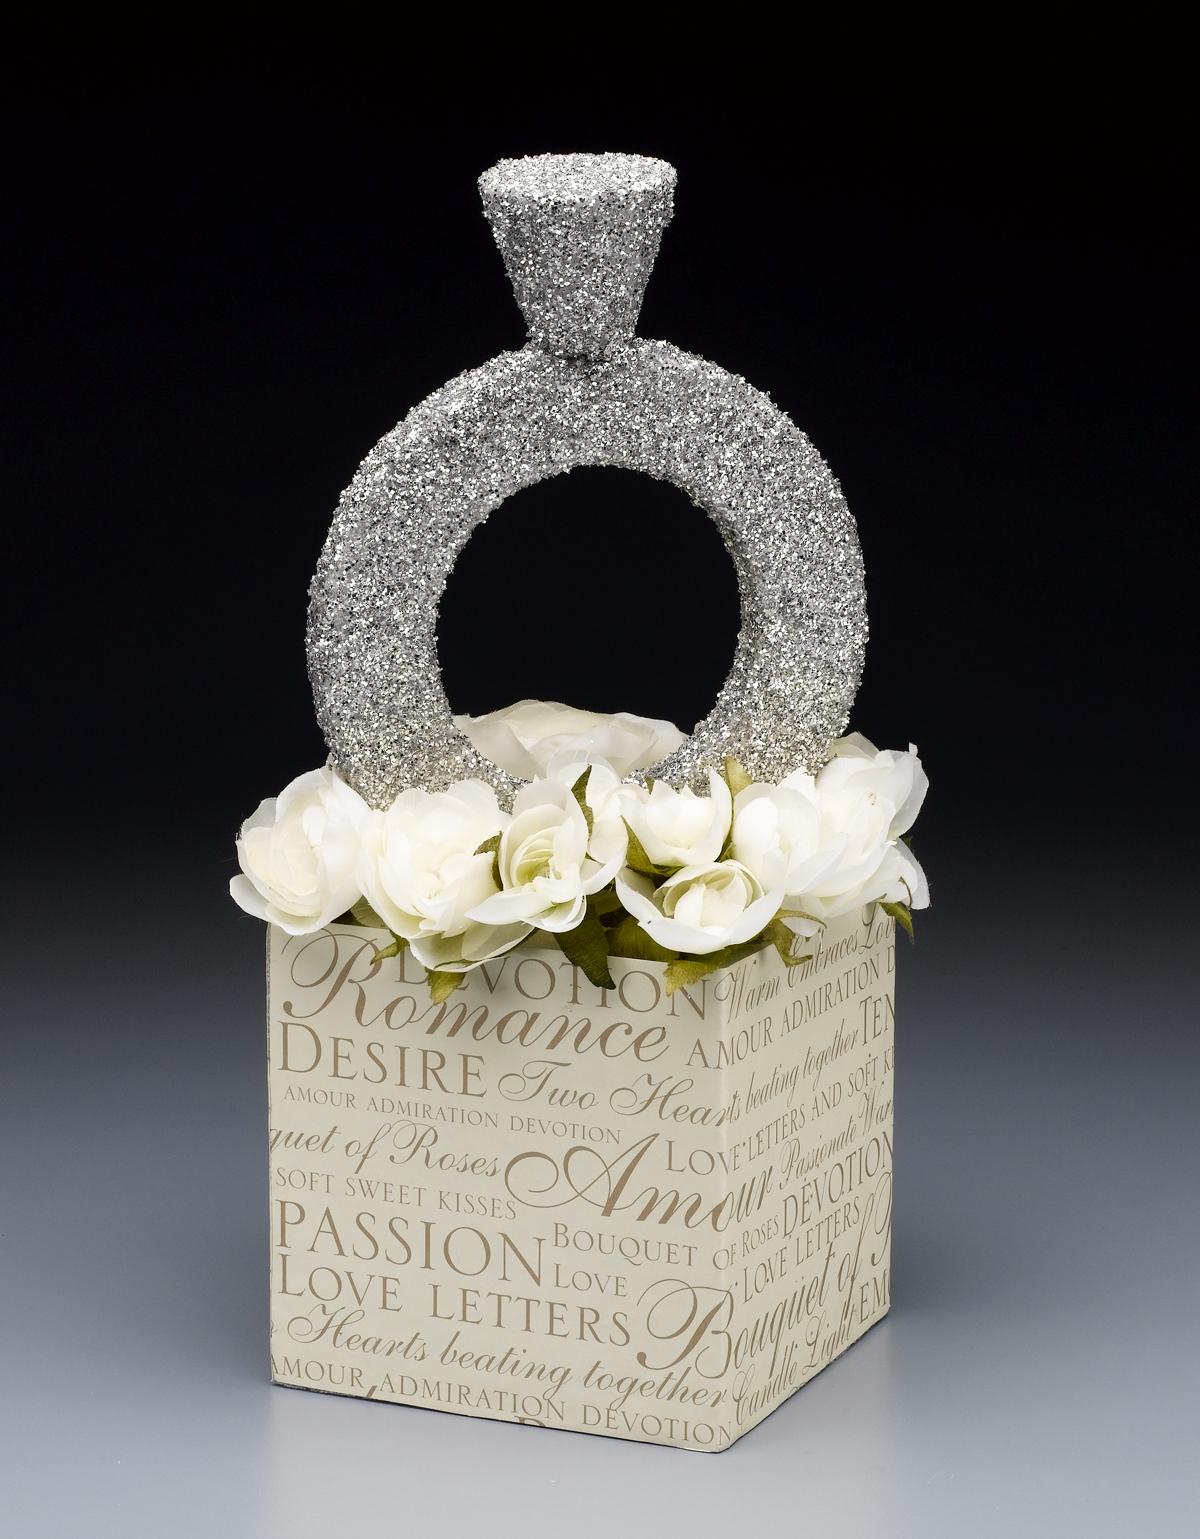 Diamond ring centerpiece